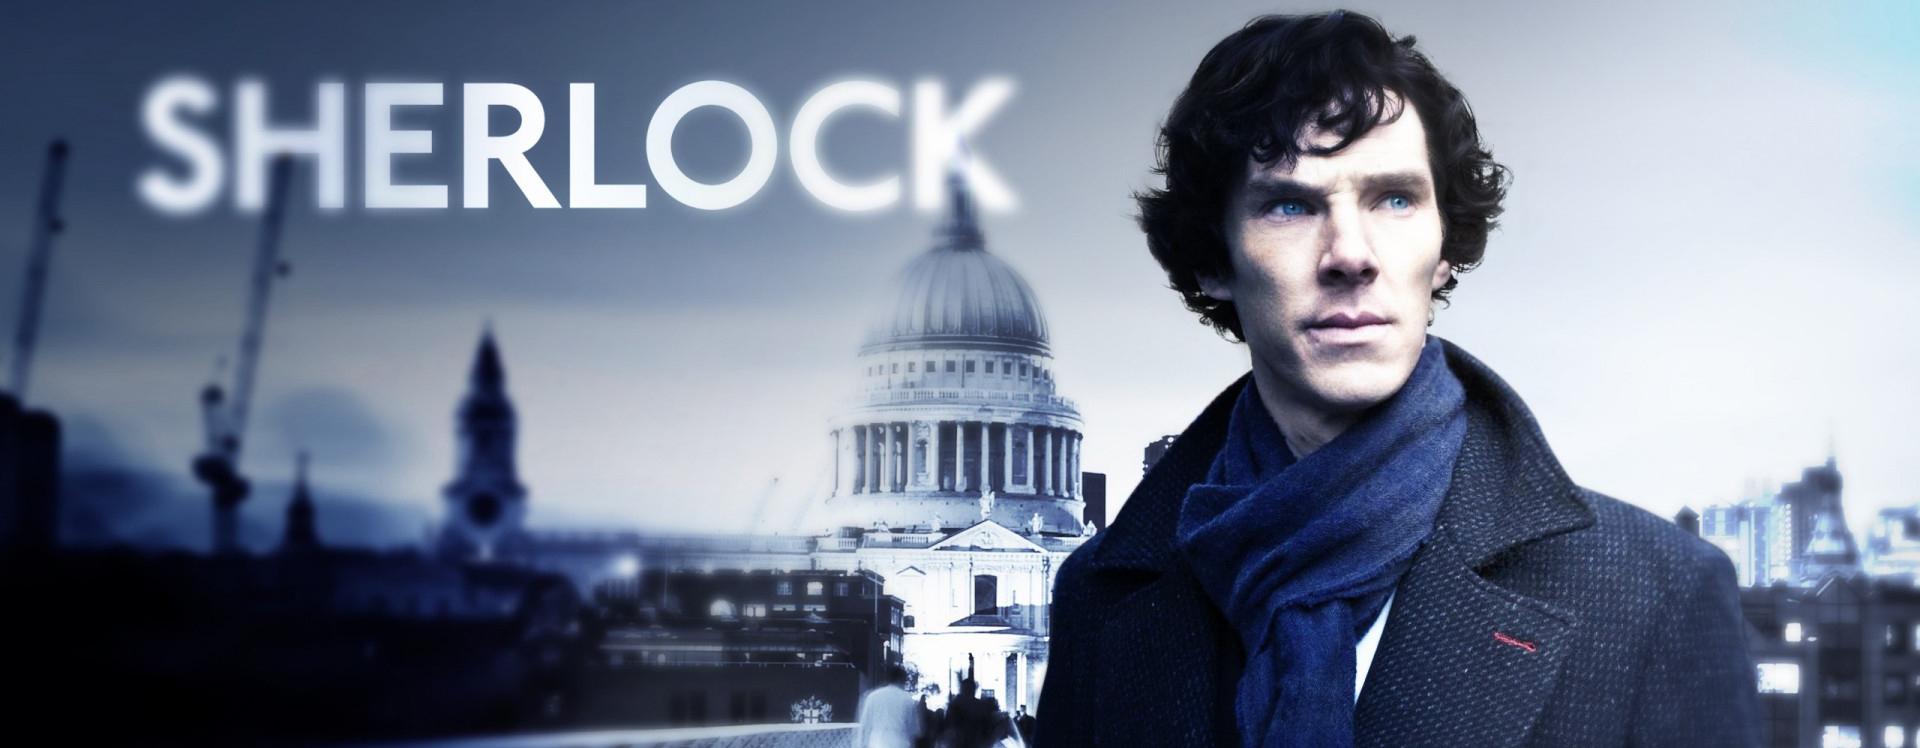 Sherlock _0